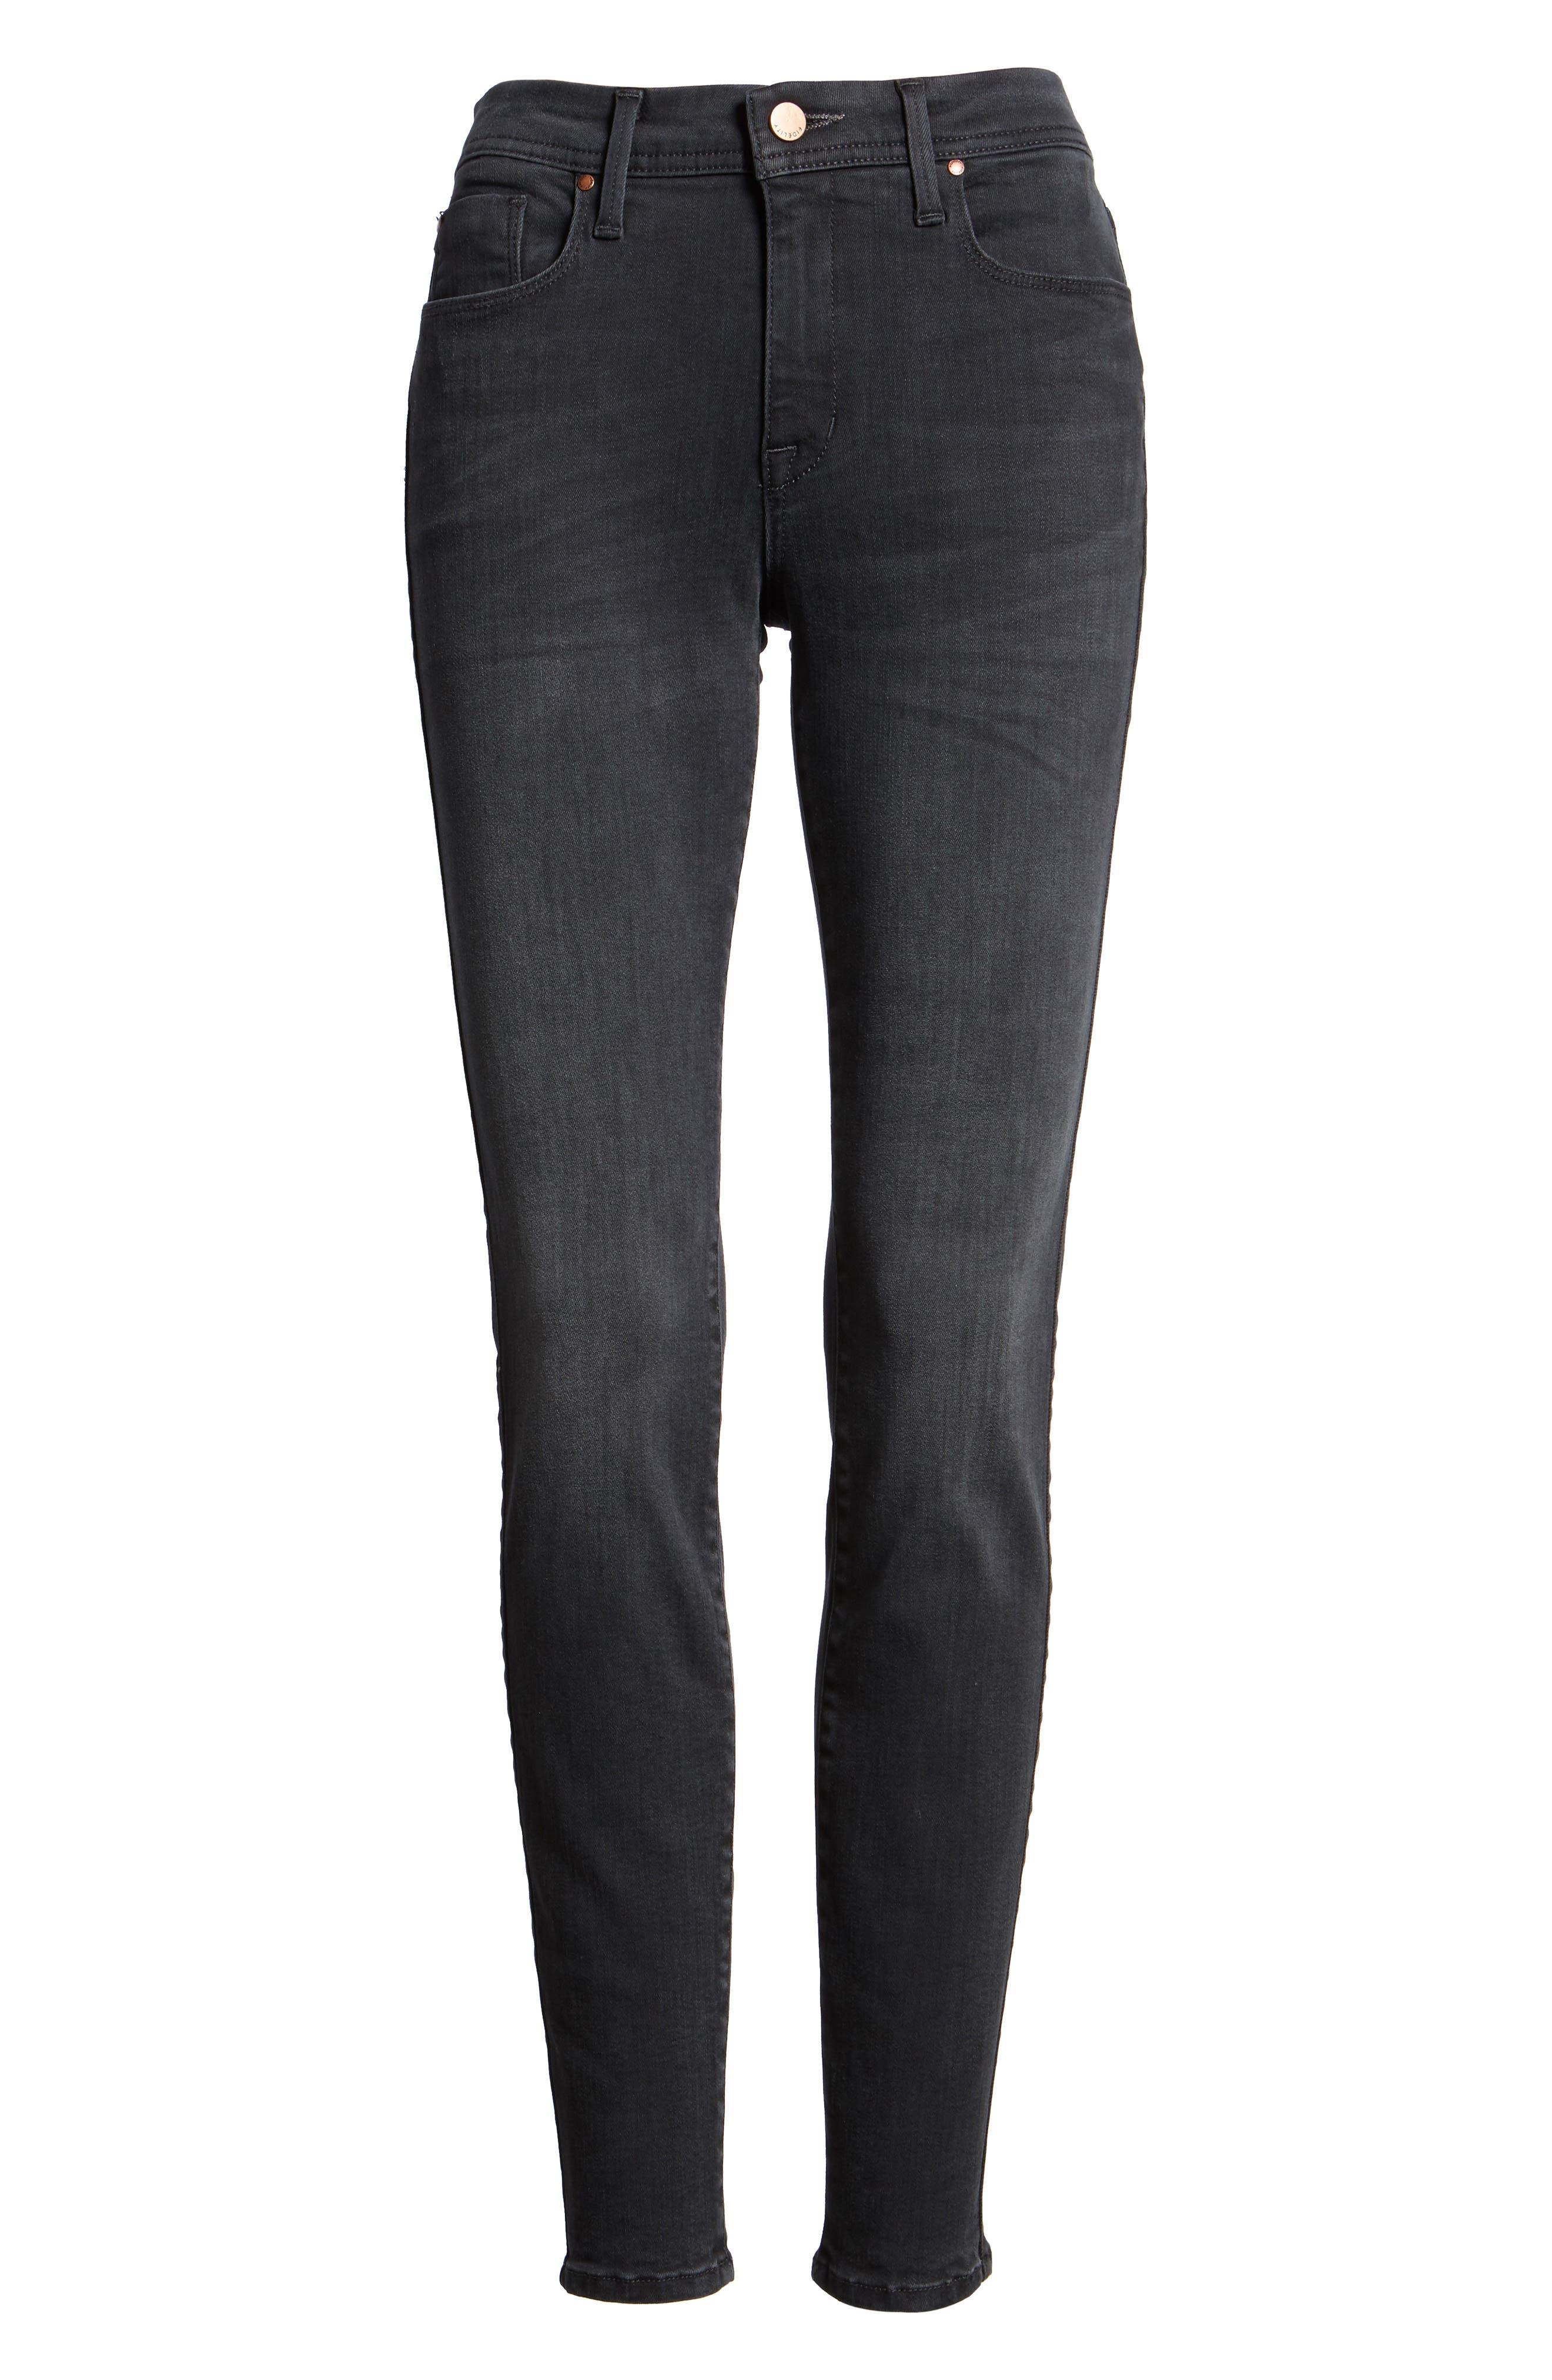 Belvedere Skinny Jeans,                             Alternate thumbnail 6, color,                             001